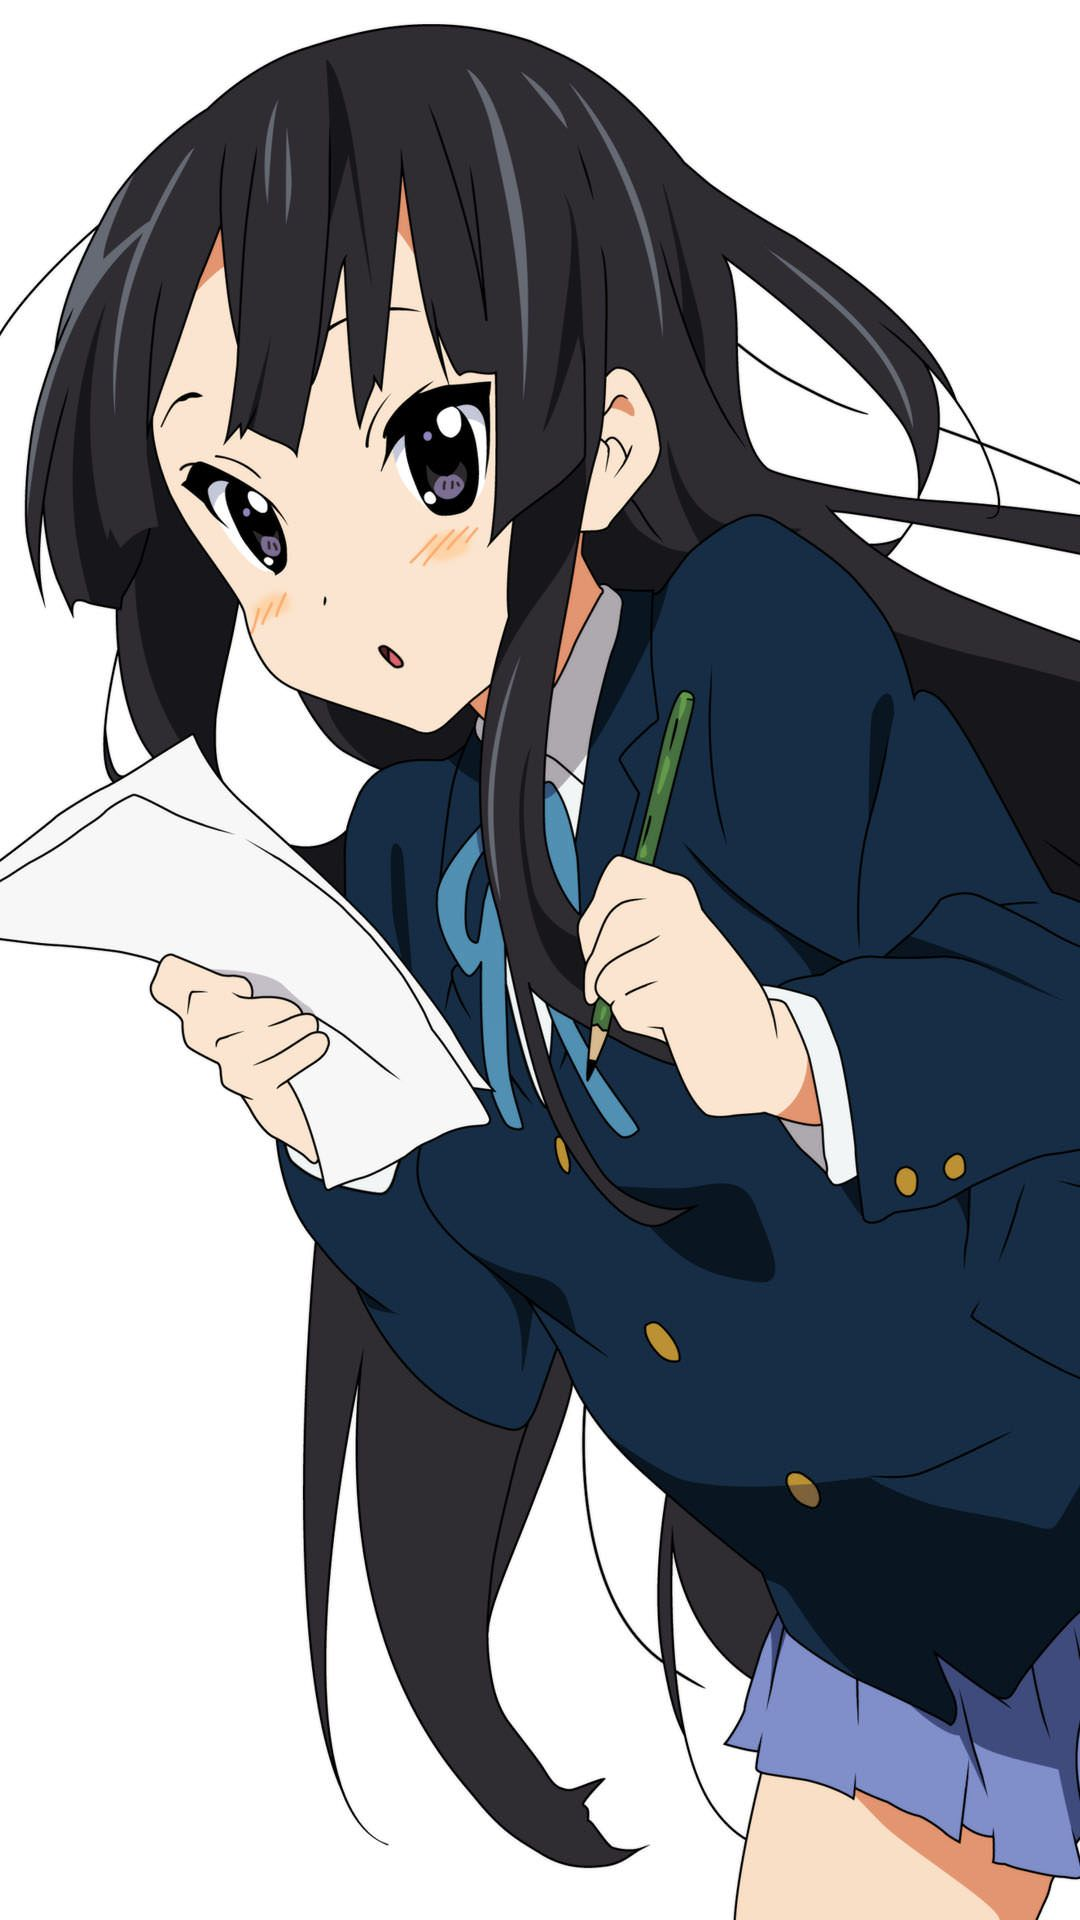 k-on! Part 5 - eyxDEF/100 - Anime Image